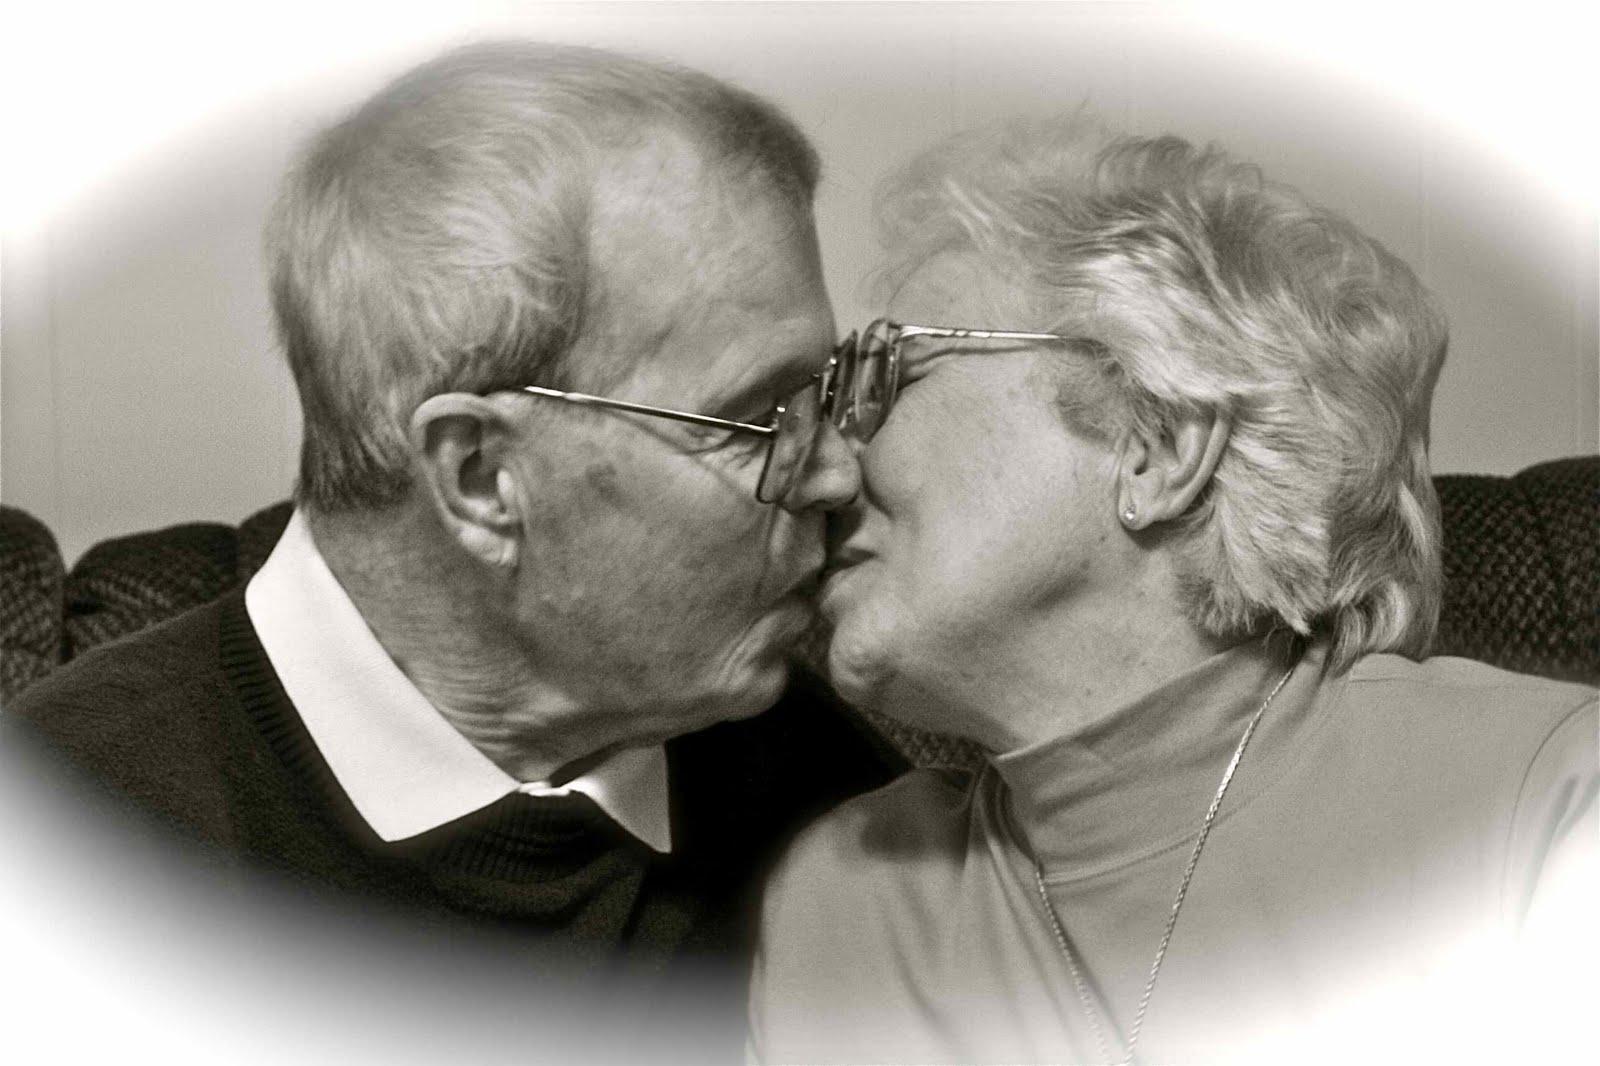 Happy 60th Wedding Anniversary!